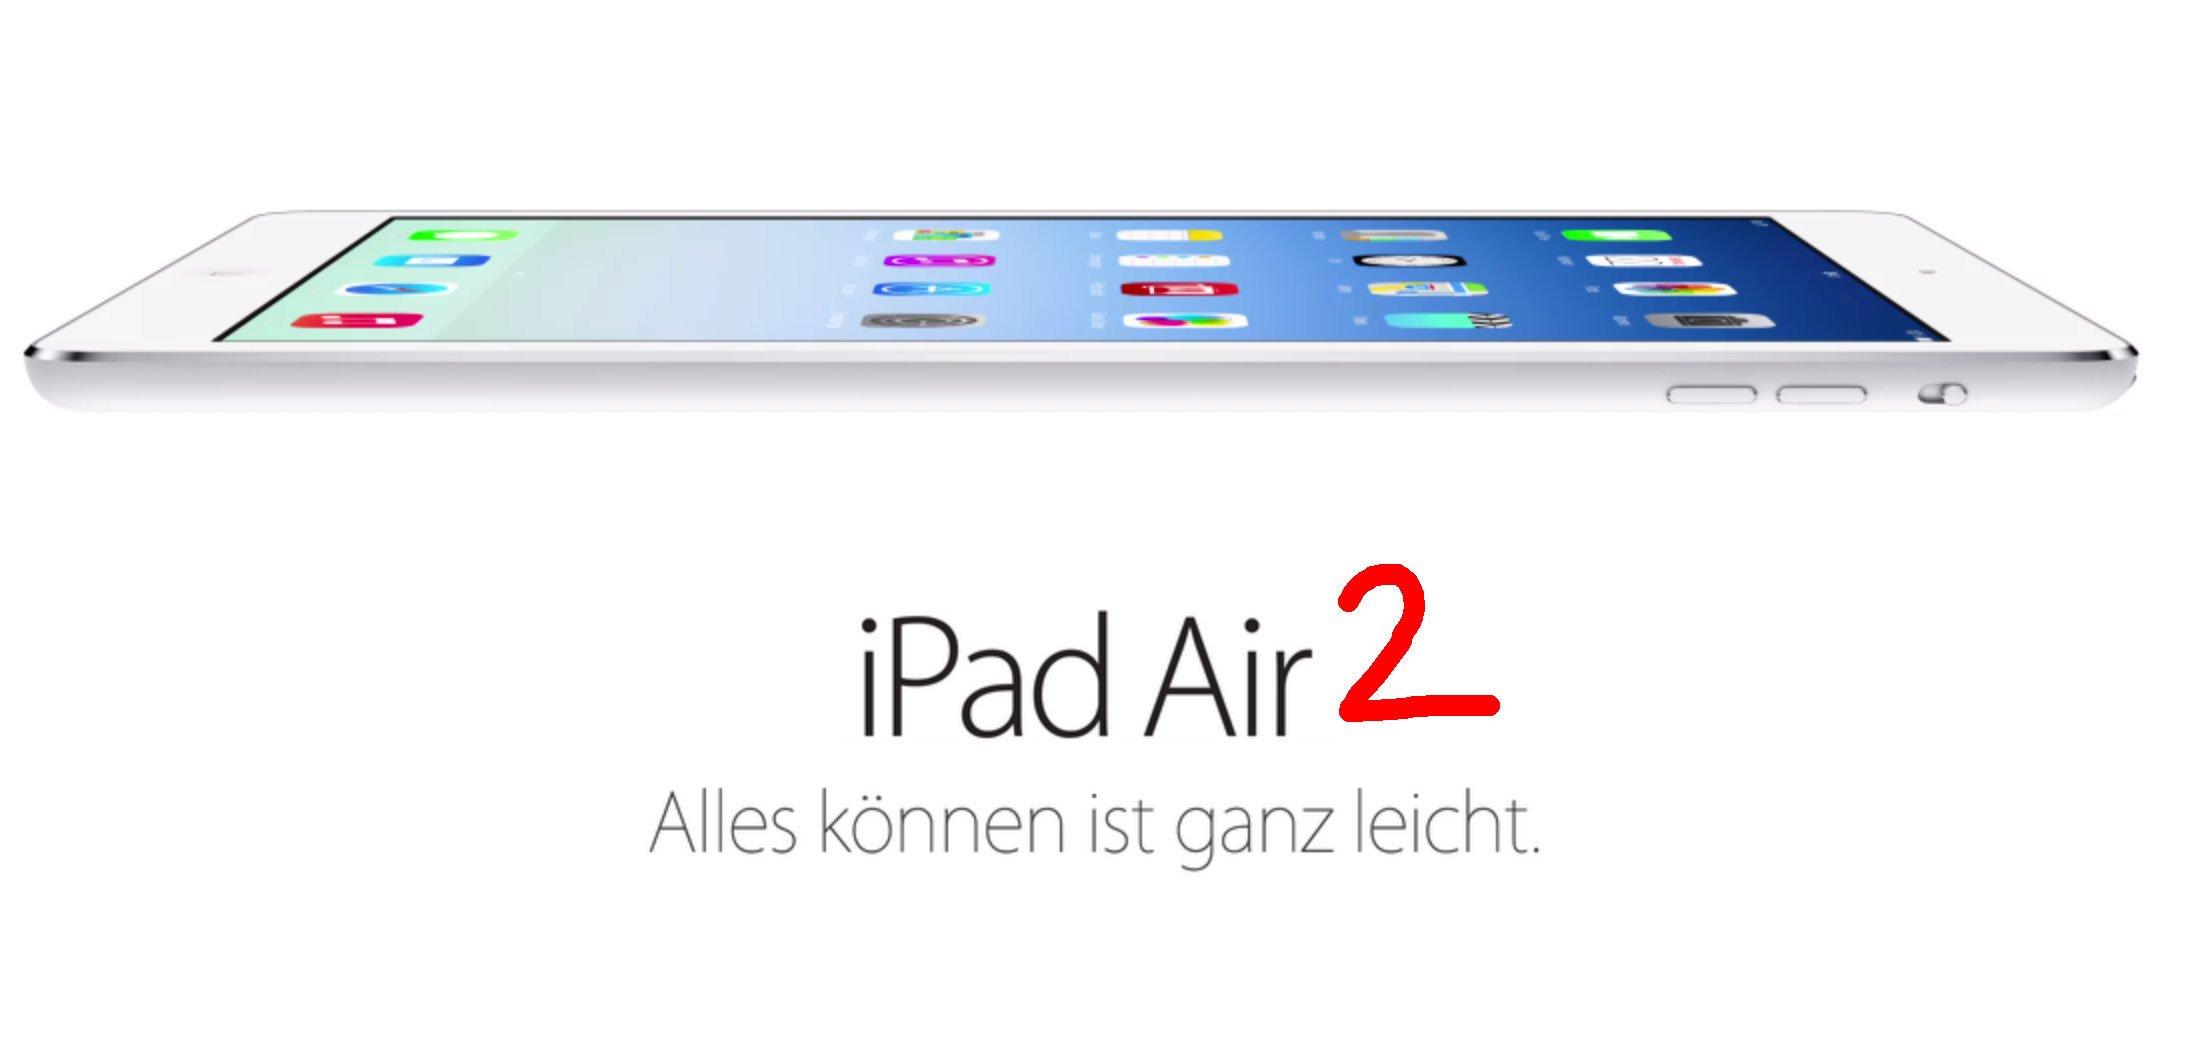 Apple iPad Air 2 Keynote doch früher? 11